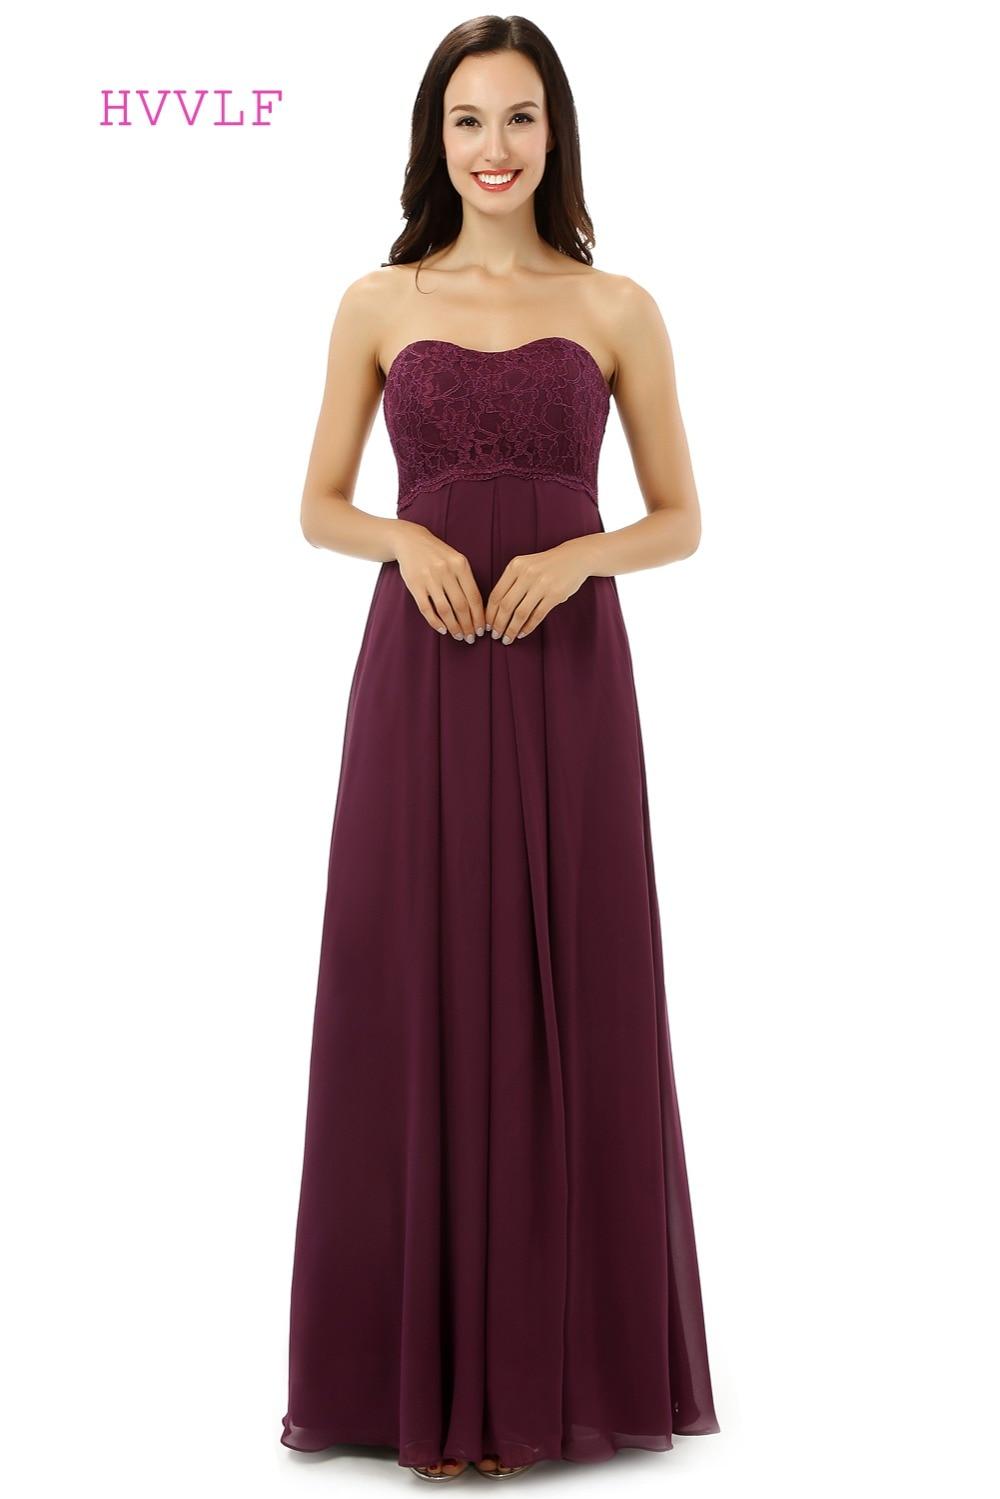 HVVLF 2019 Cheap   Bridesmaid     Dresses   Under 50 A-line Sweetheart Floor Length Purple Chiffon Lace Wedding Party   Dresses